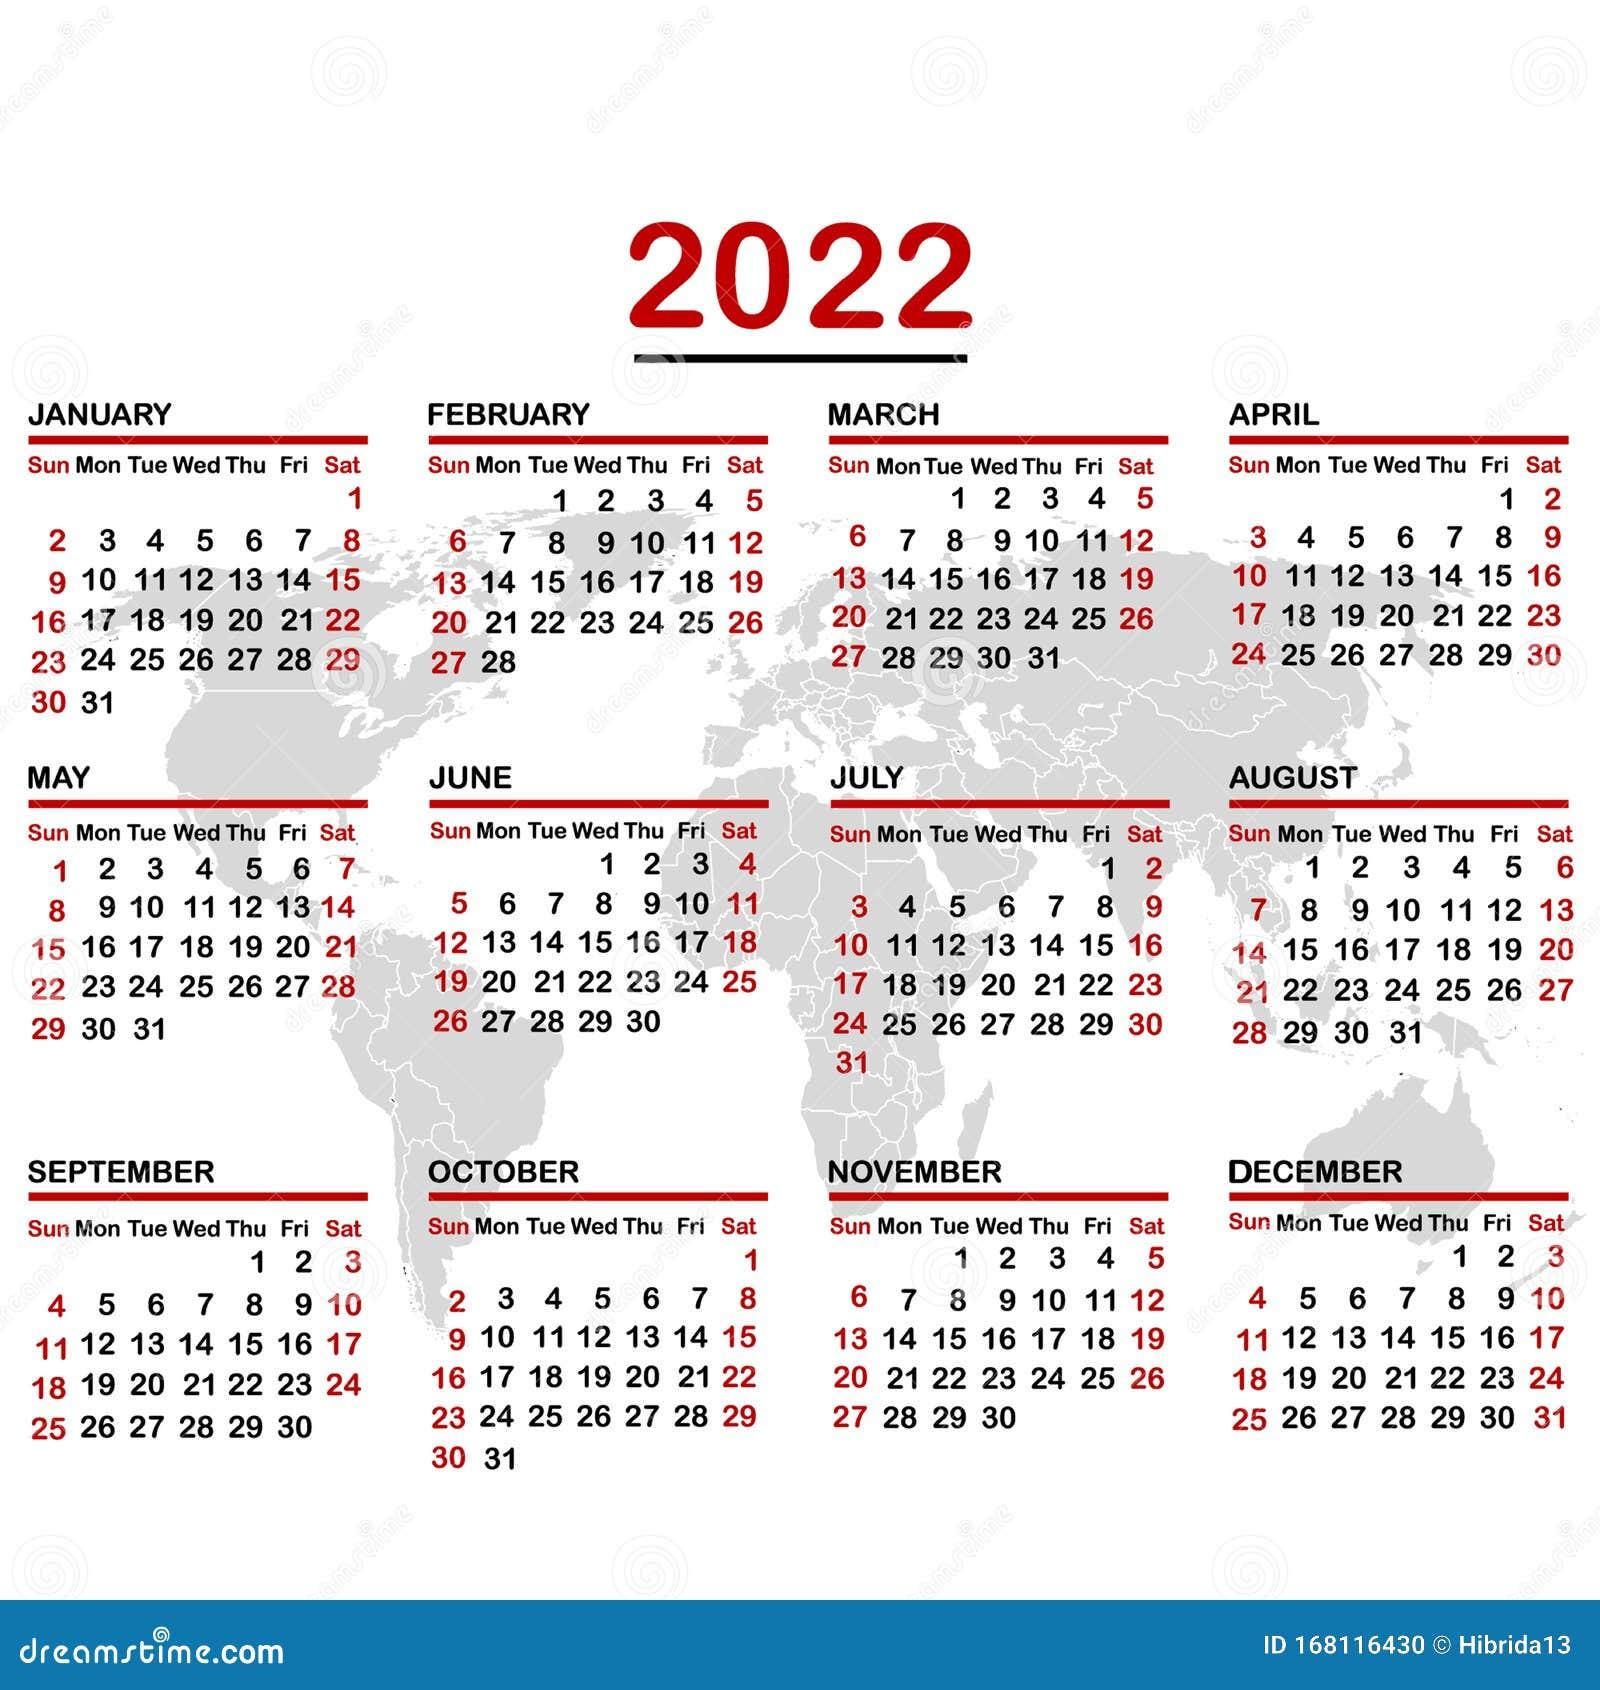 2022 19 Calendar.2022 Calendar With World Map Stock Vector Illustration Of Ocean Minimal 168116430